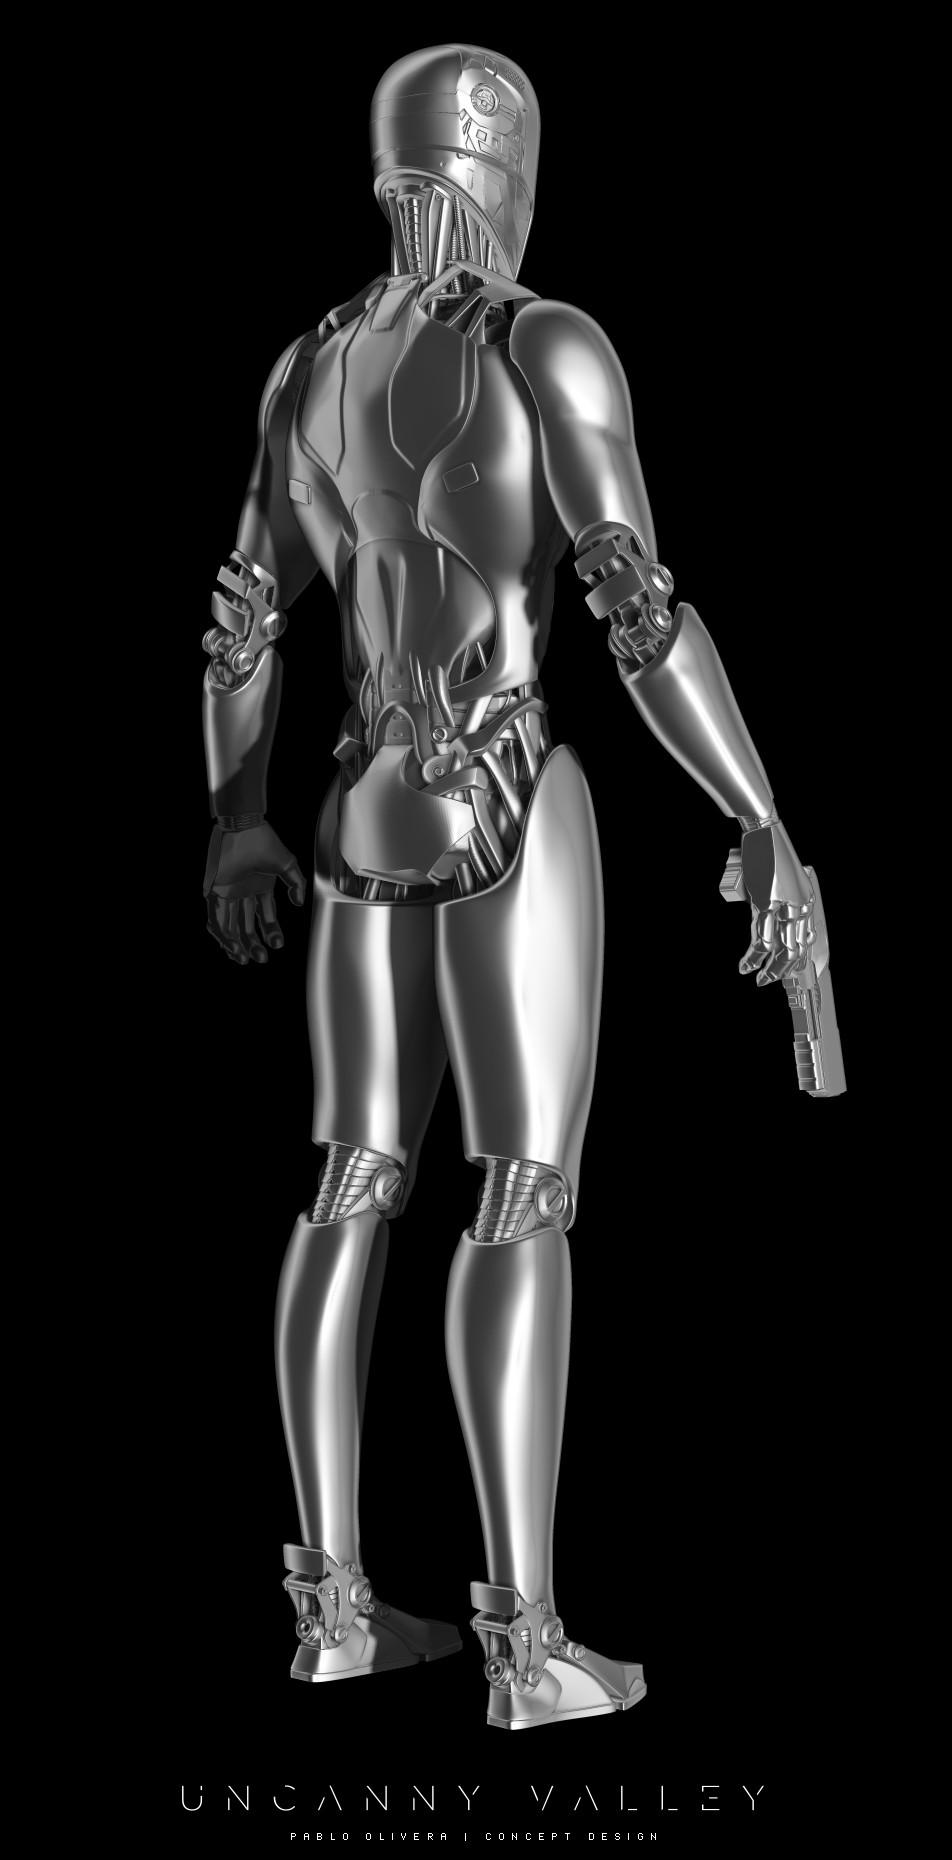 Pablo olivera uncanny valley character design robot 04